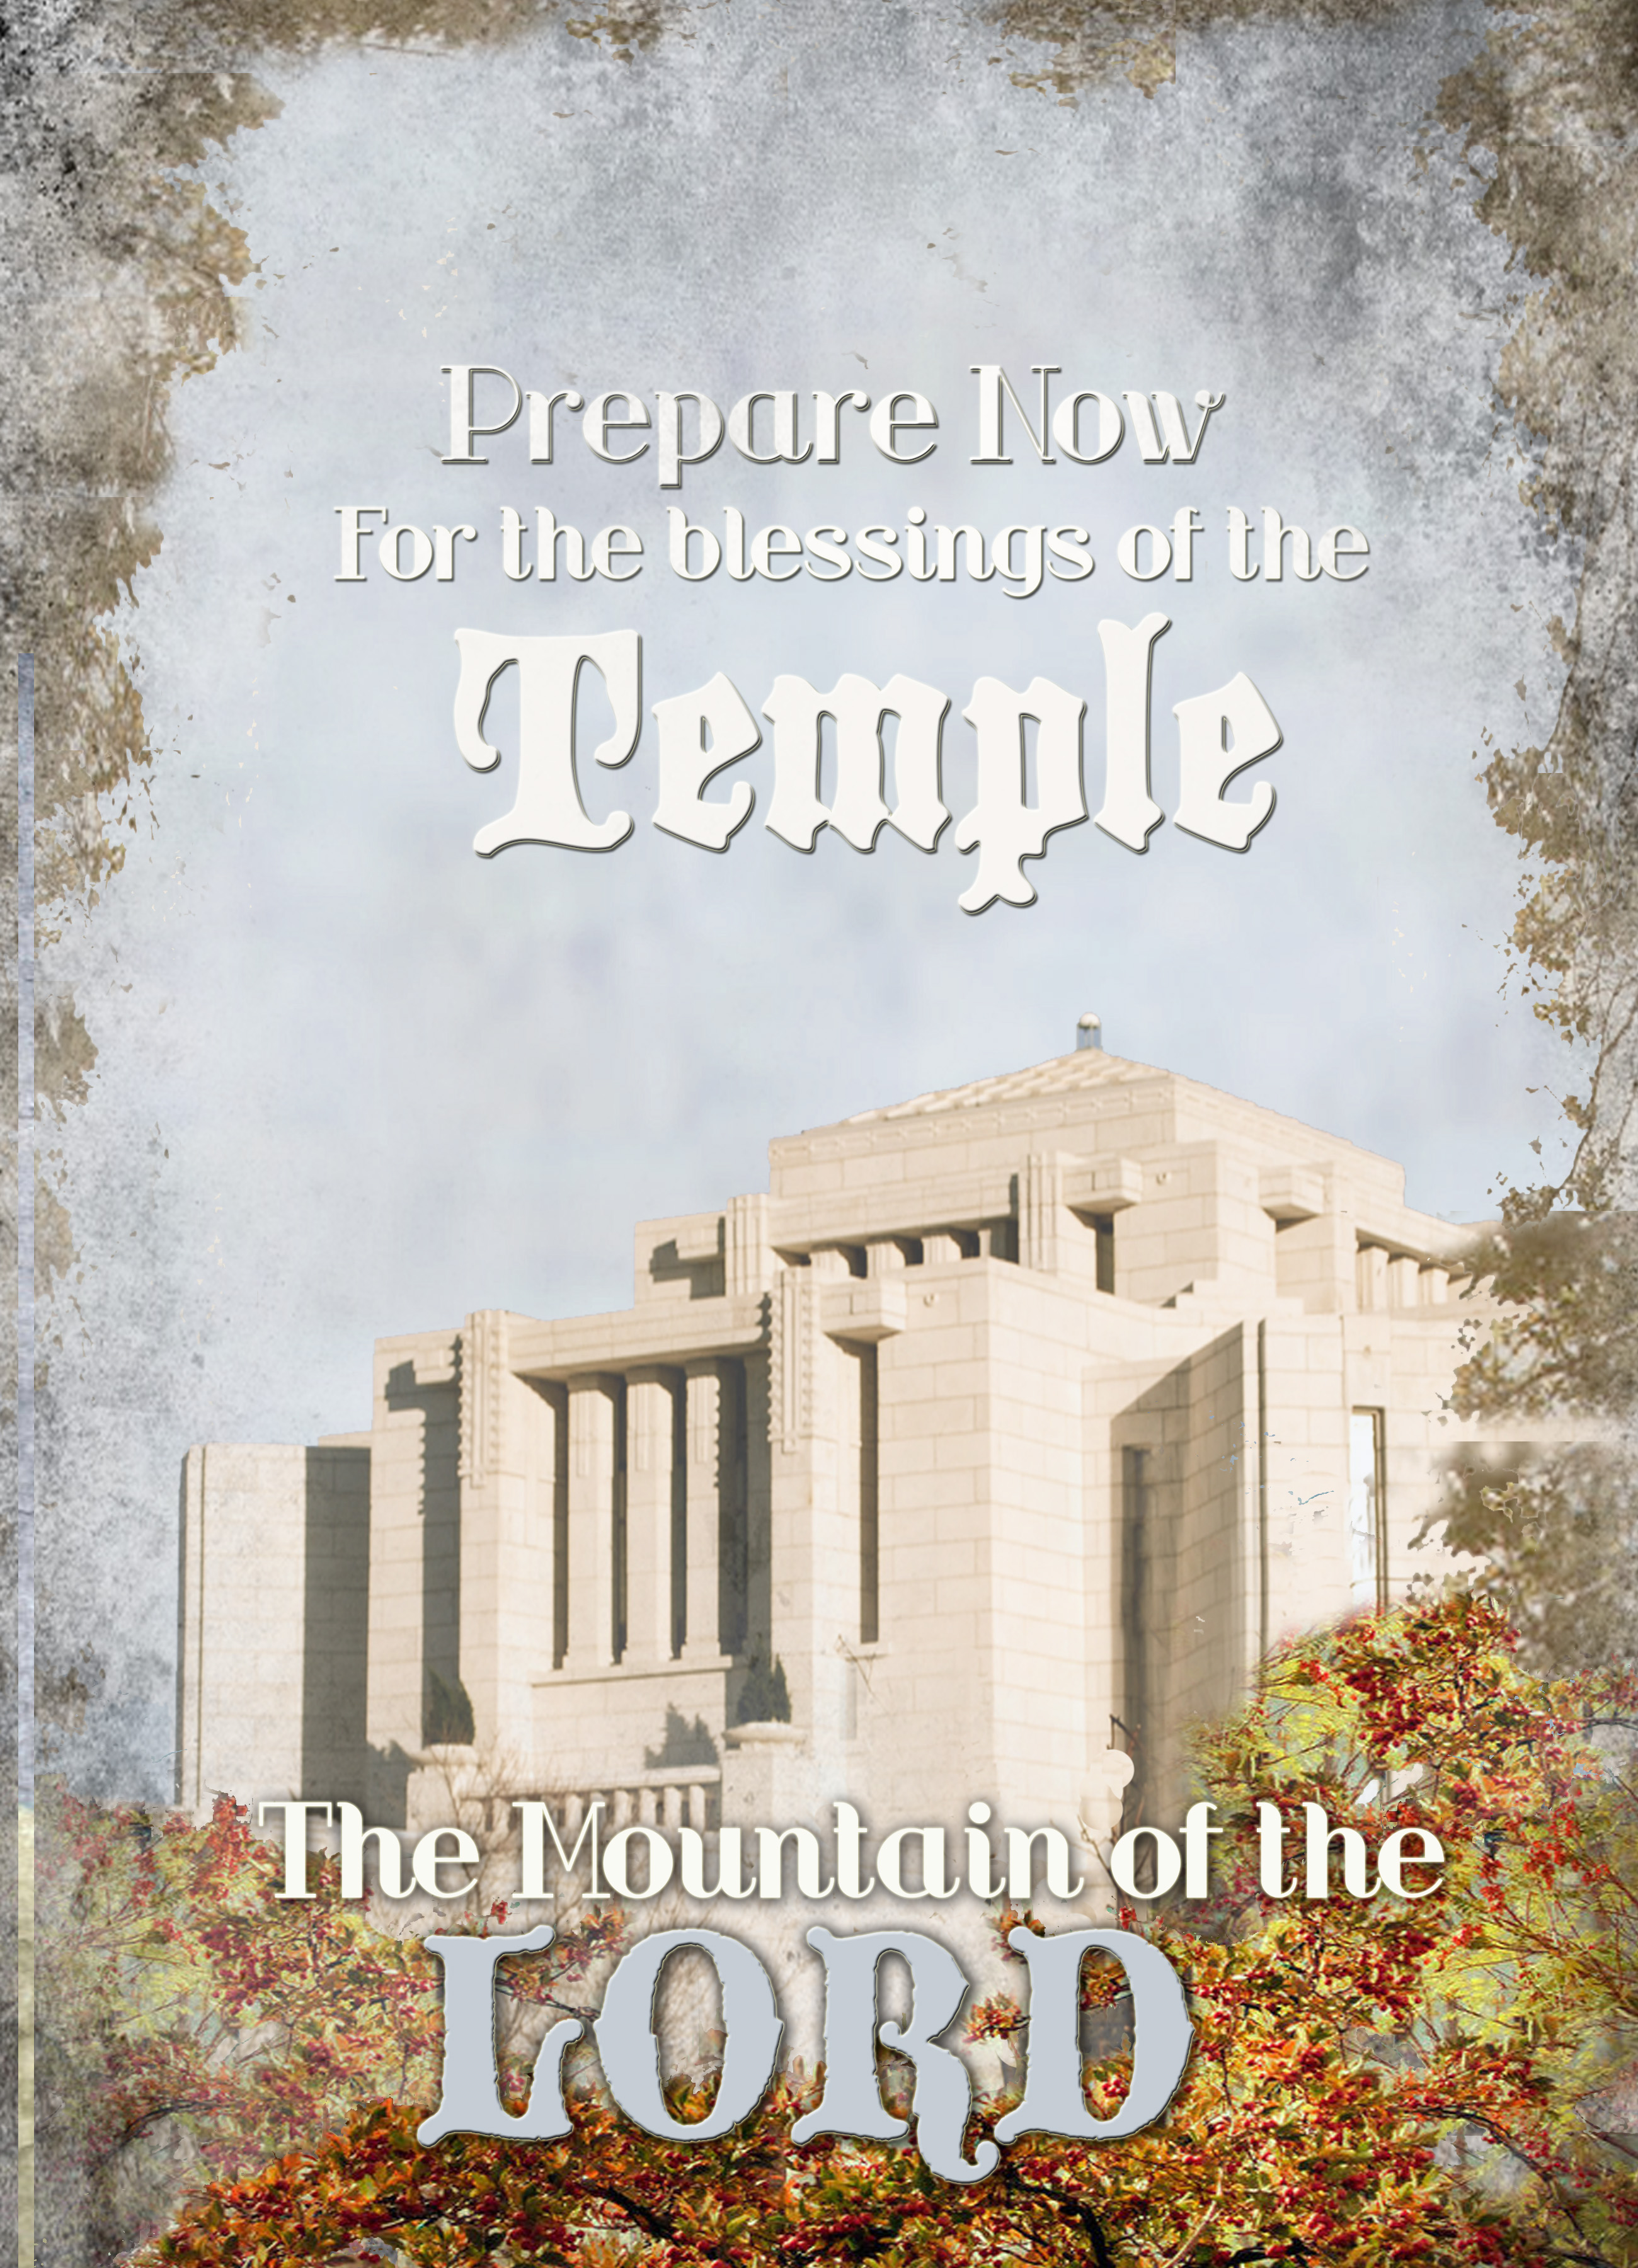 Temple quote #5